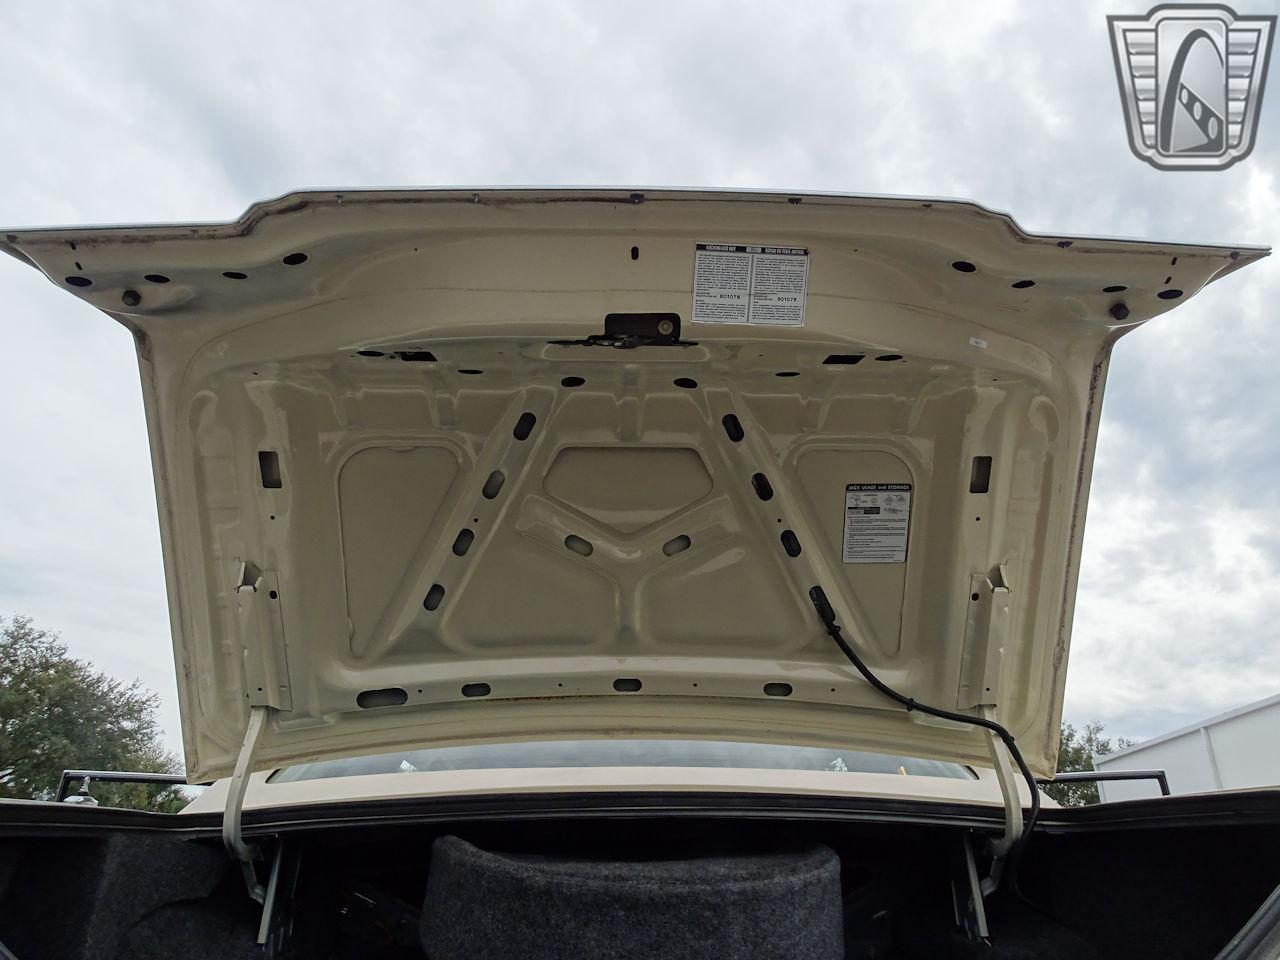 1983 Lincoln Continental 95